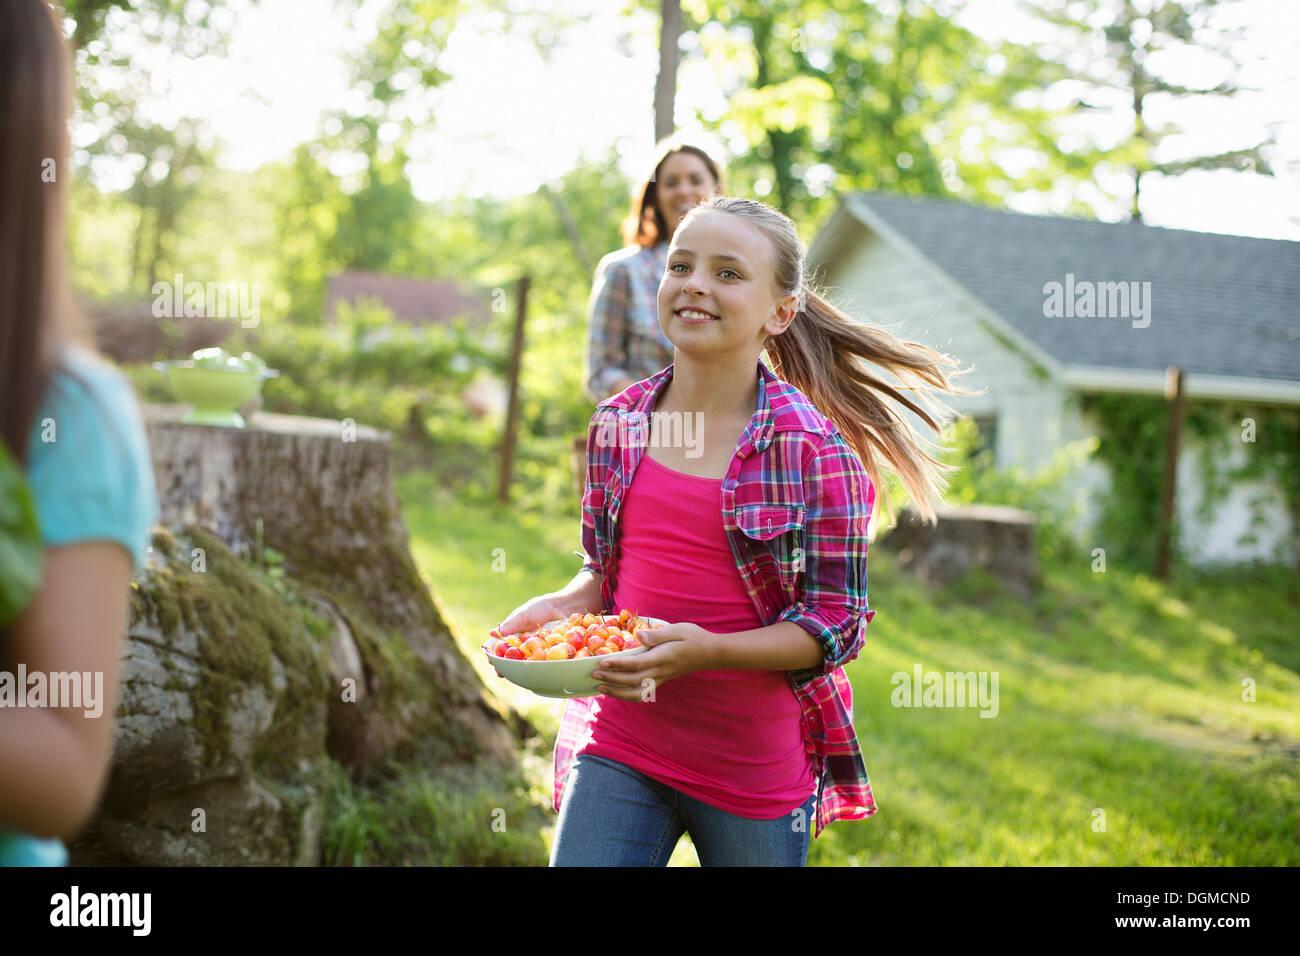 Organic farm. Summer party. Three girls running across the grass. - Stock Image